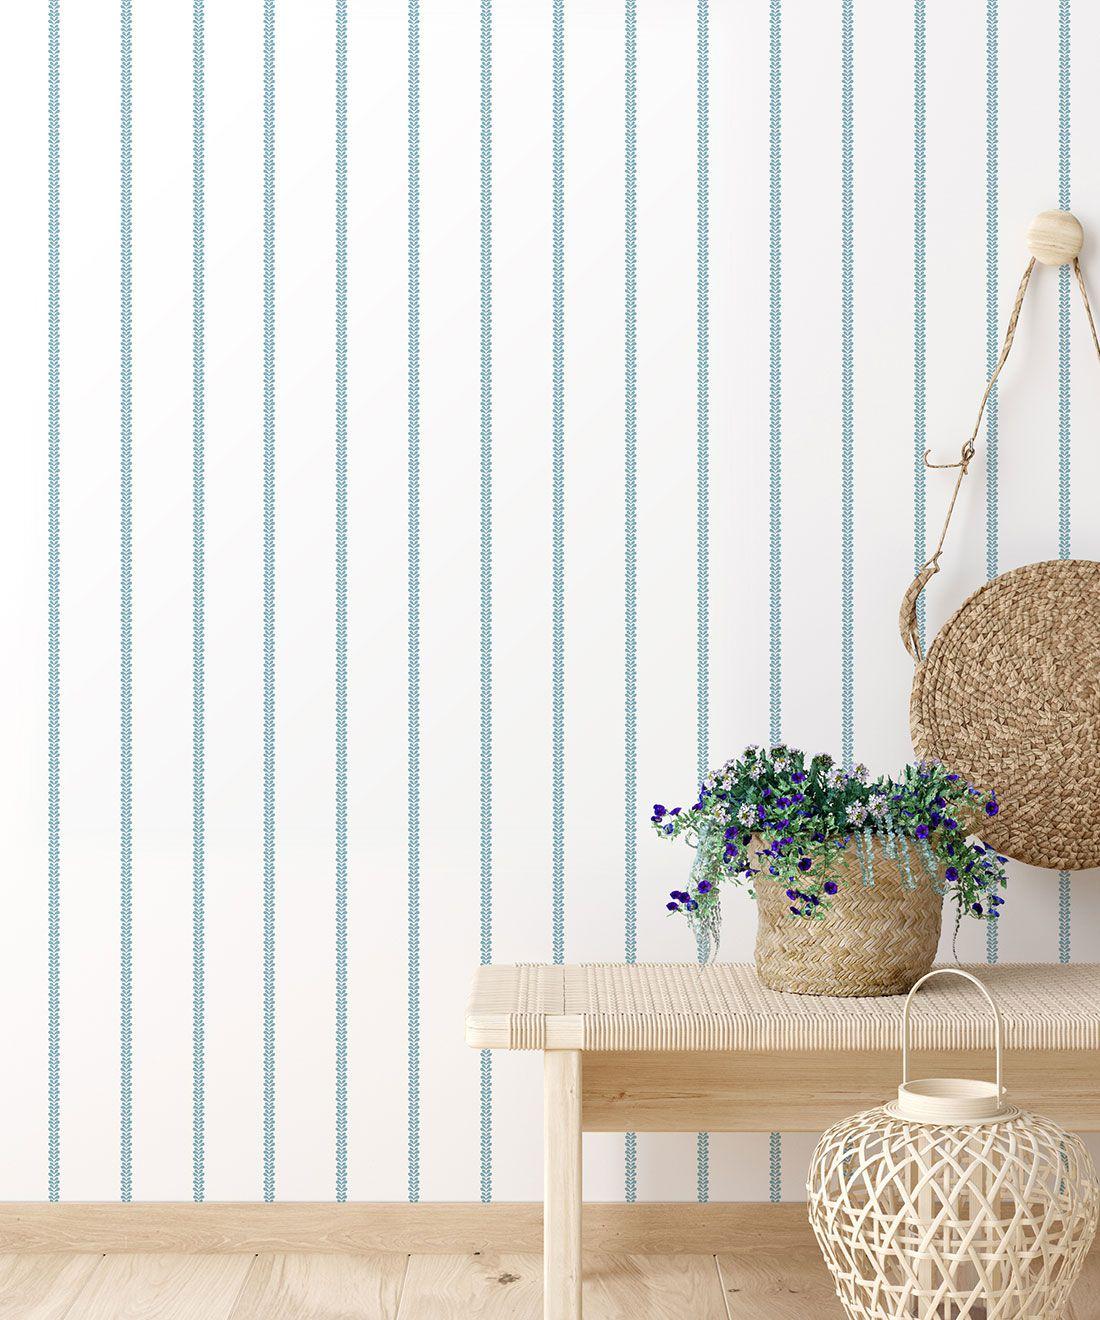 Chemin Wallpaper • Striped Wallpaper • Powder Blue • Insitu